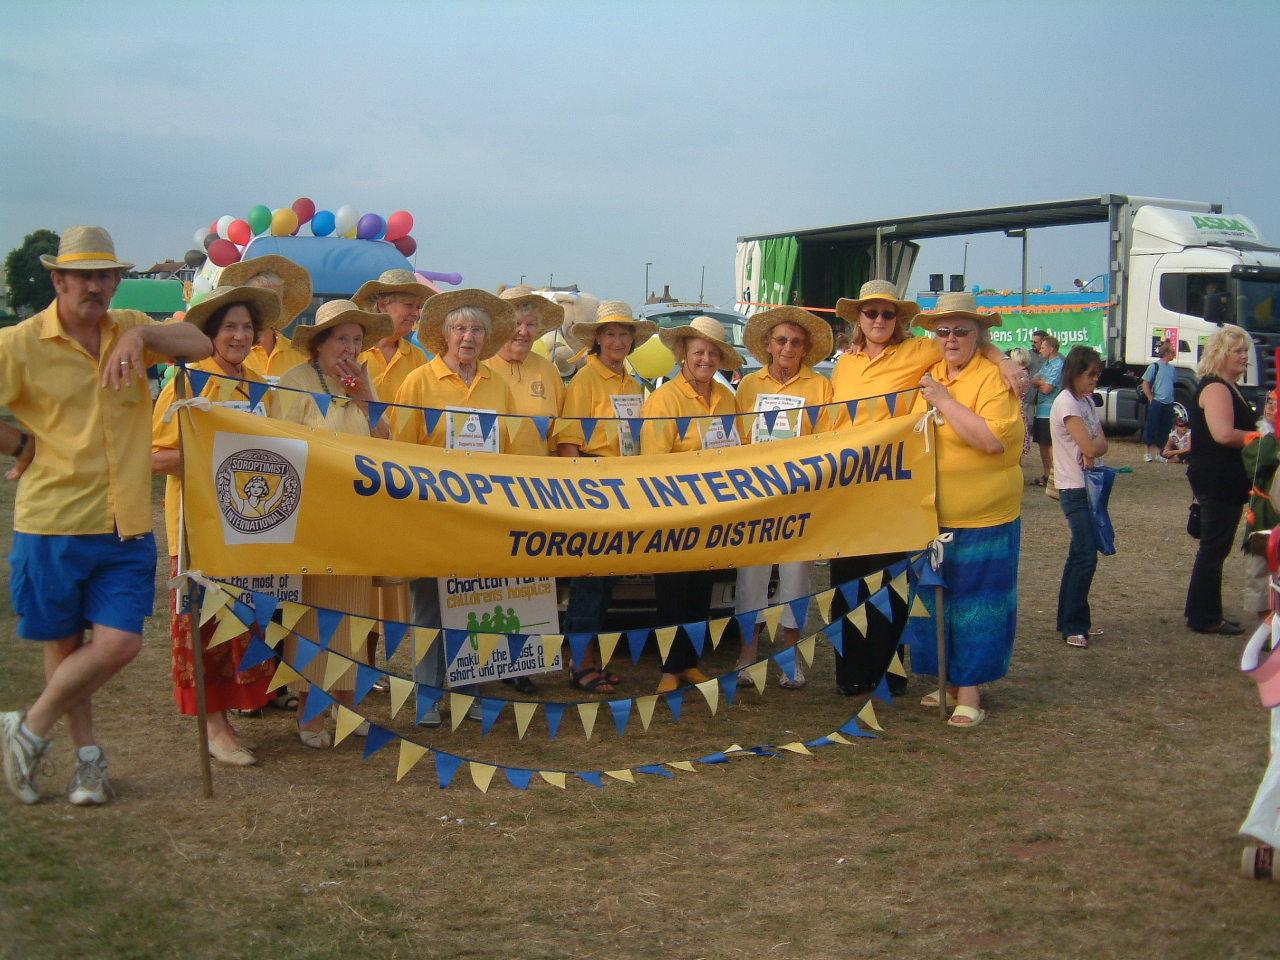 members of Torquay club taking part as walking group in Carnival